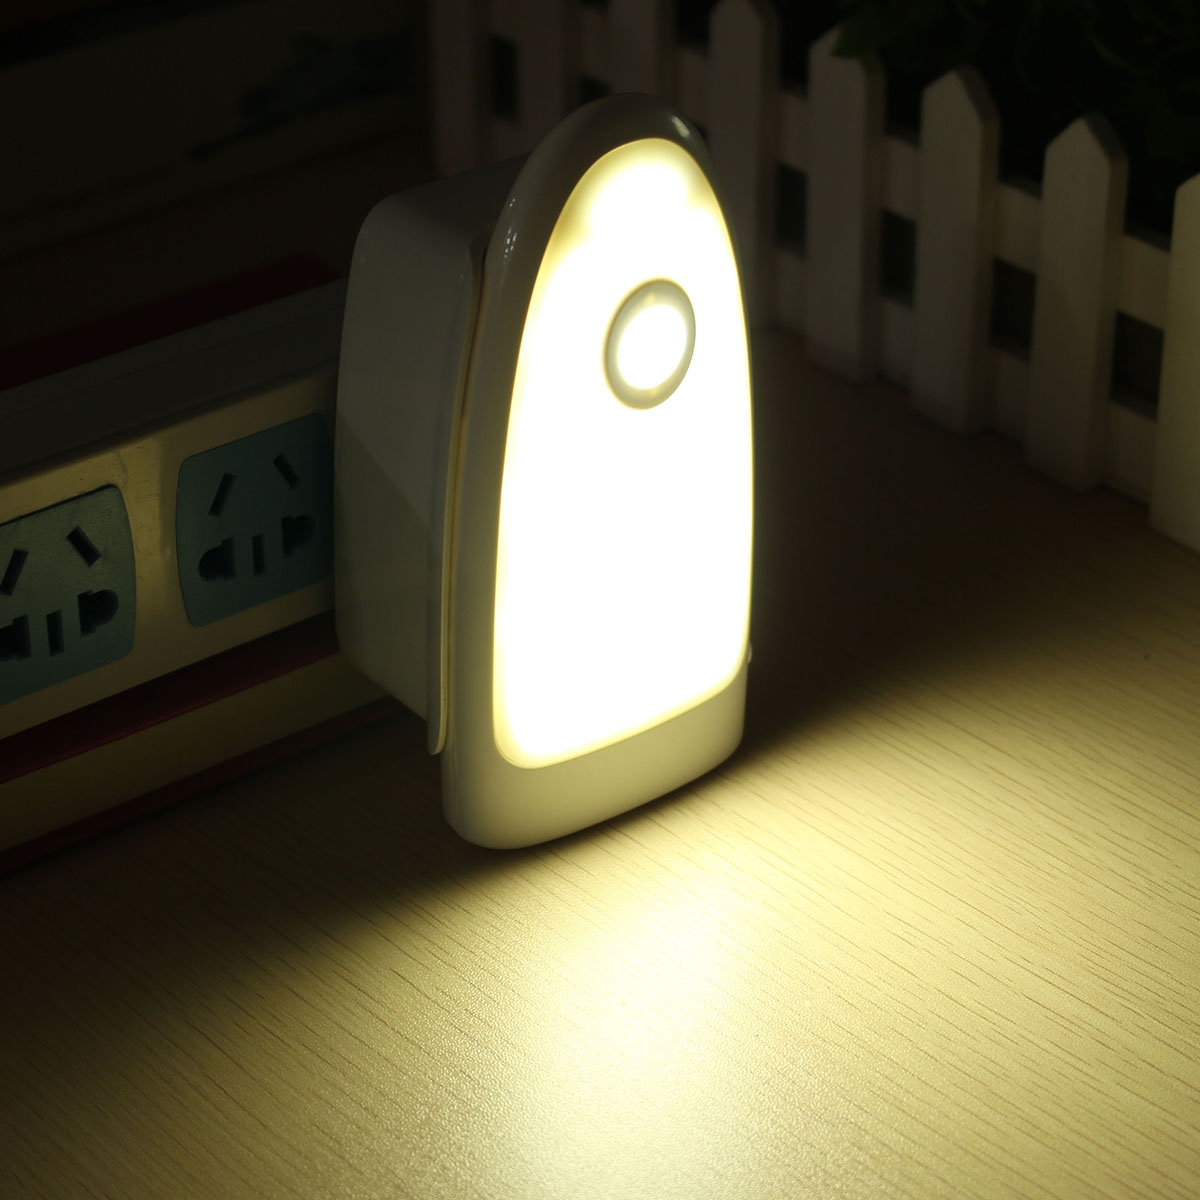 Led smart night lamp - New Night Lamp Led Night Light Lamp For Bedroom Smart Wireless Pir Motion Sensor Bedside Hallway